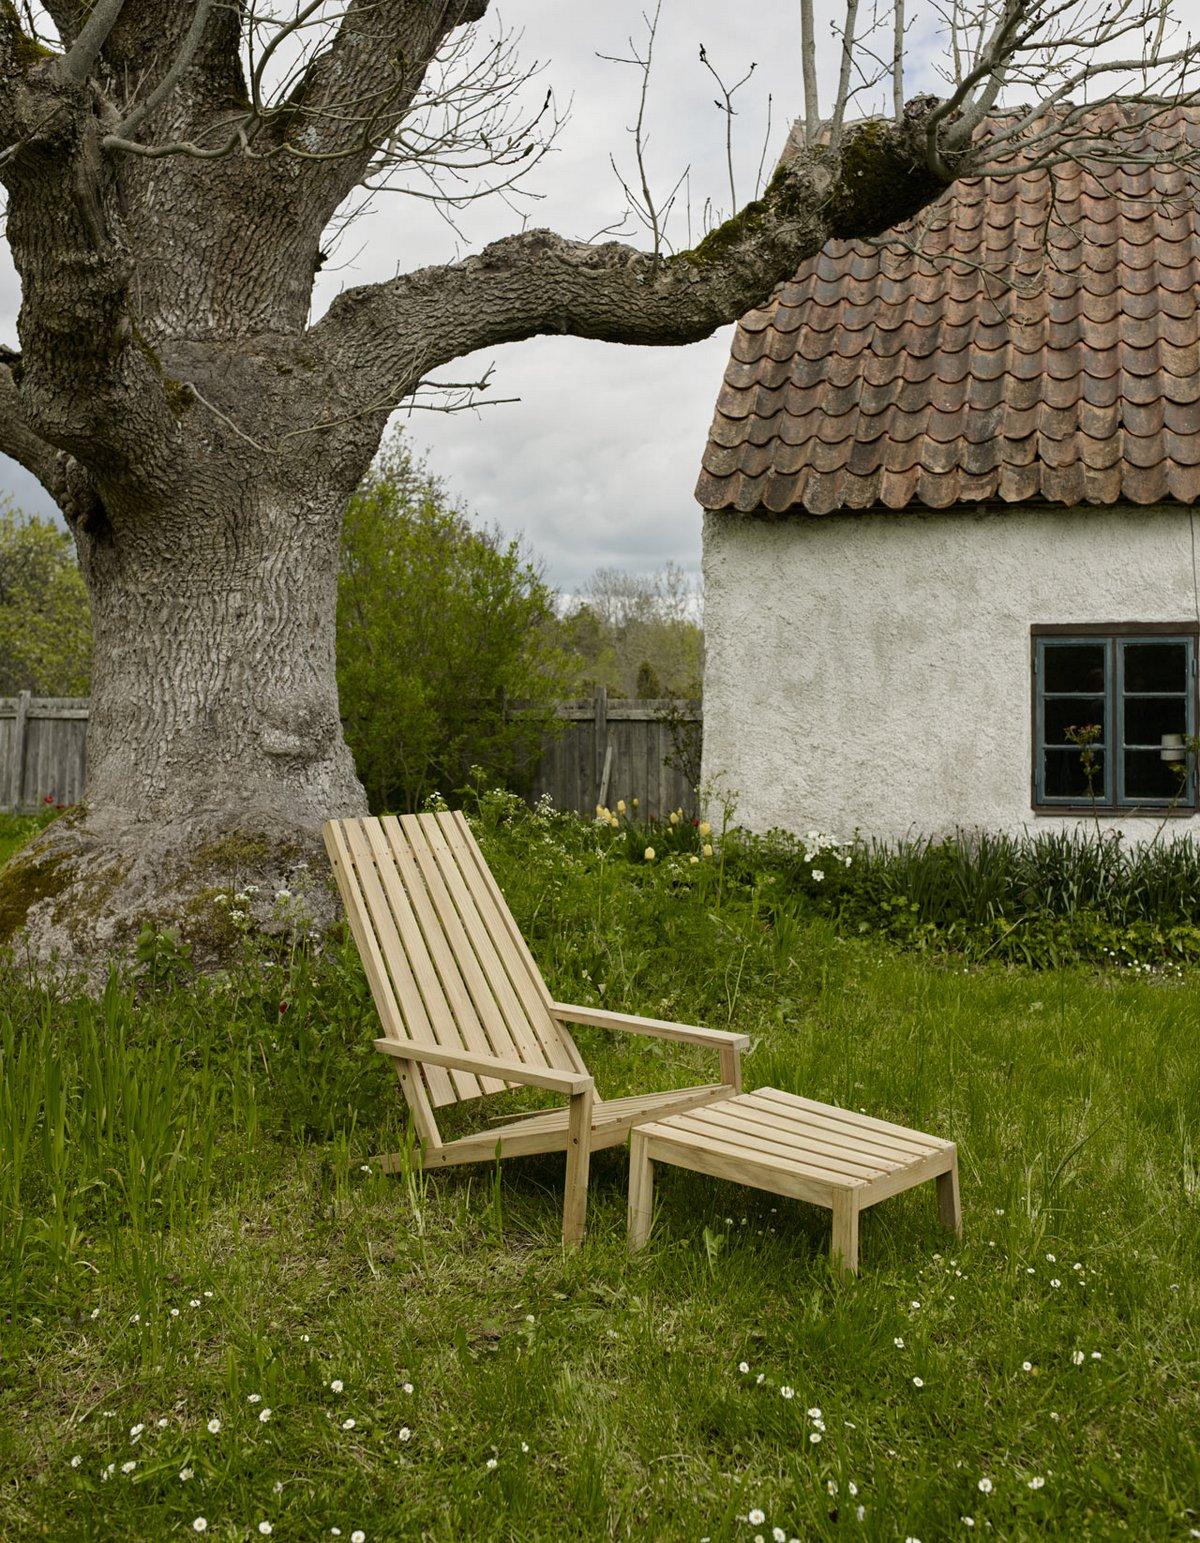 Садовый стул адирондак